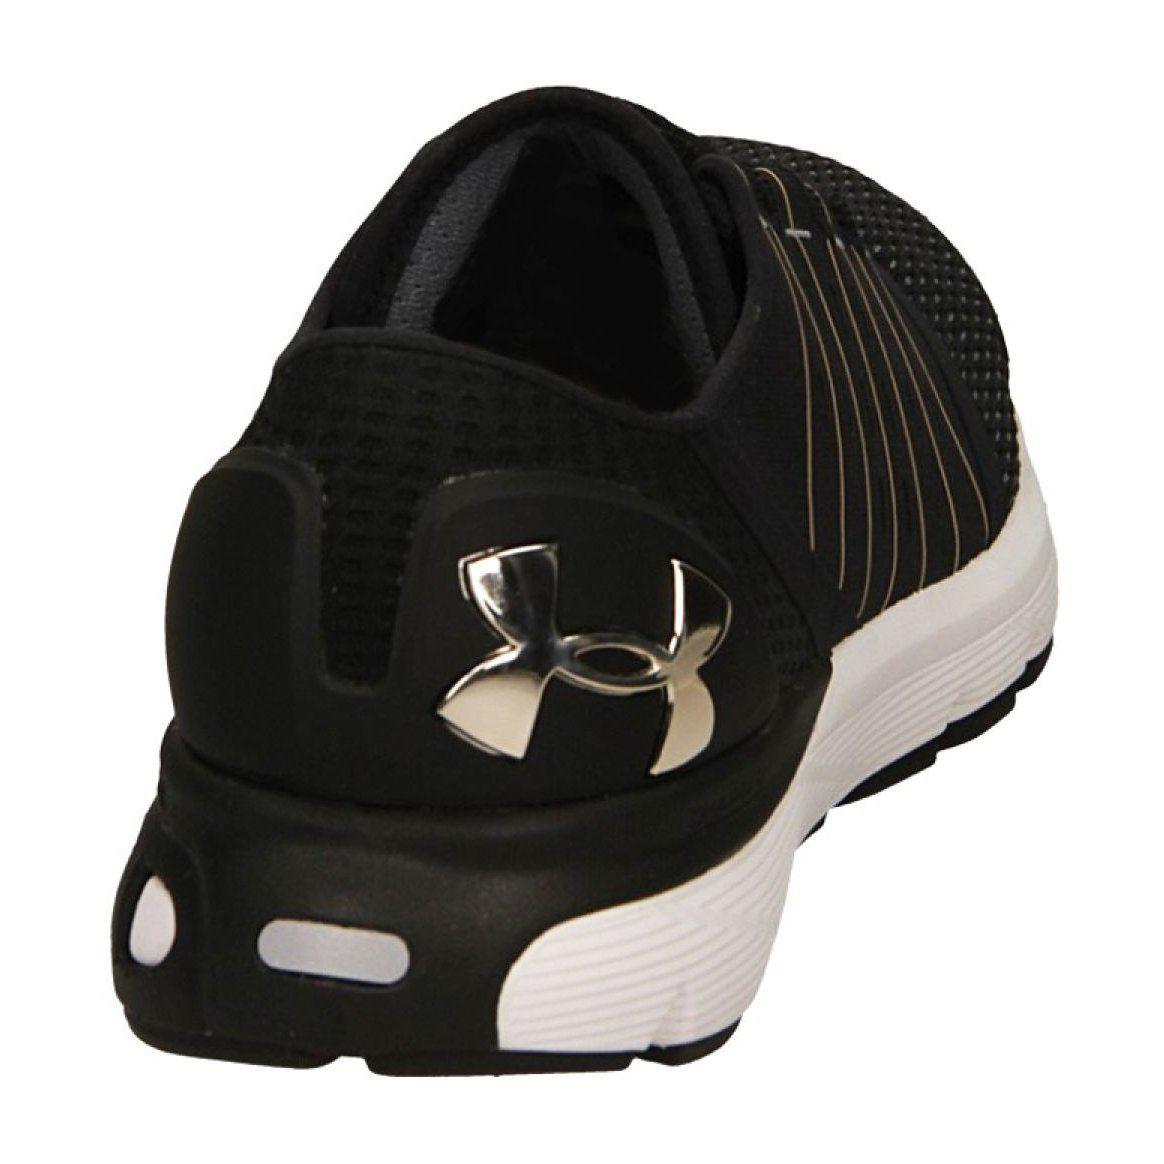 Buty Treningowe Under Armour Speedform Europa M 1285653 004 Czarne Under Armour Black Shoes Running Fashion